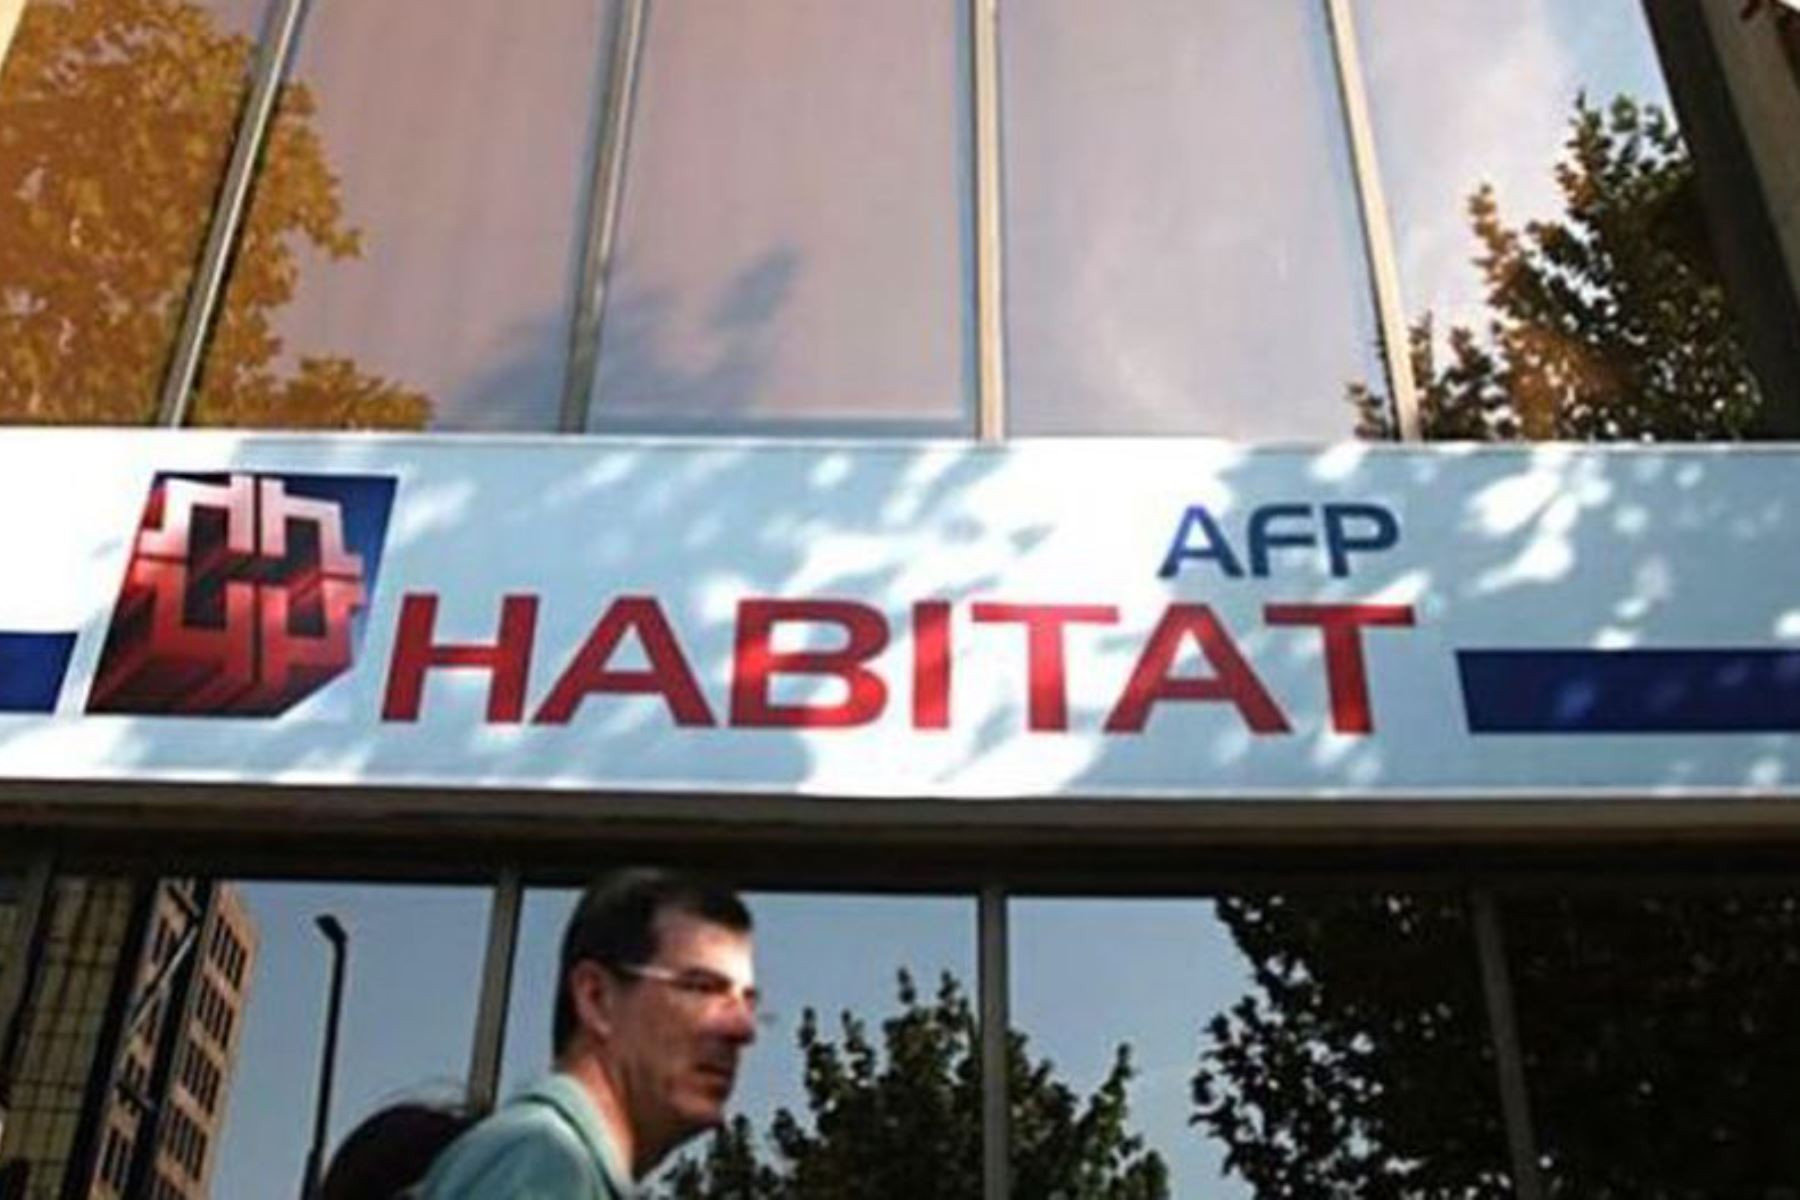 afp-habitat-acordo-reduccion-de-capital-en-s40-millones